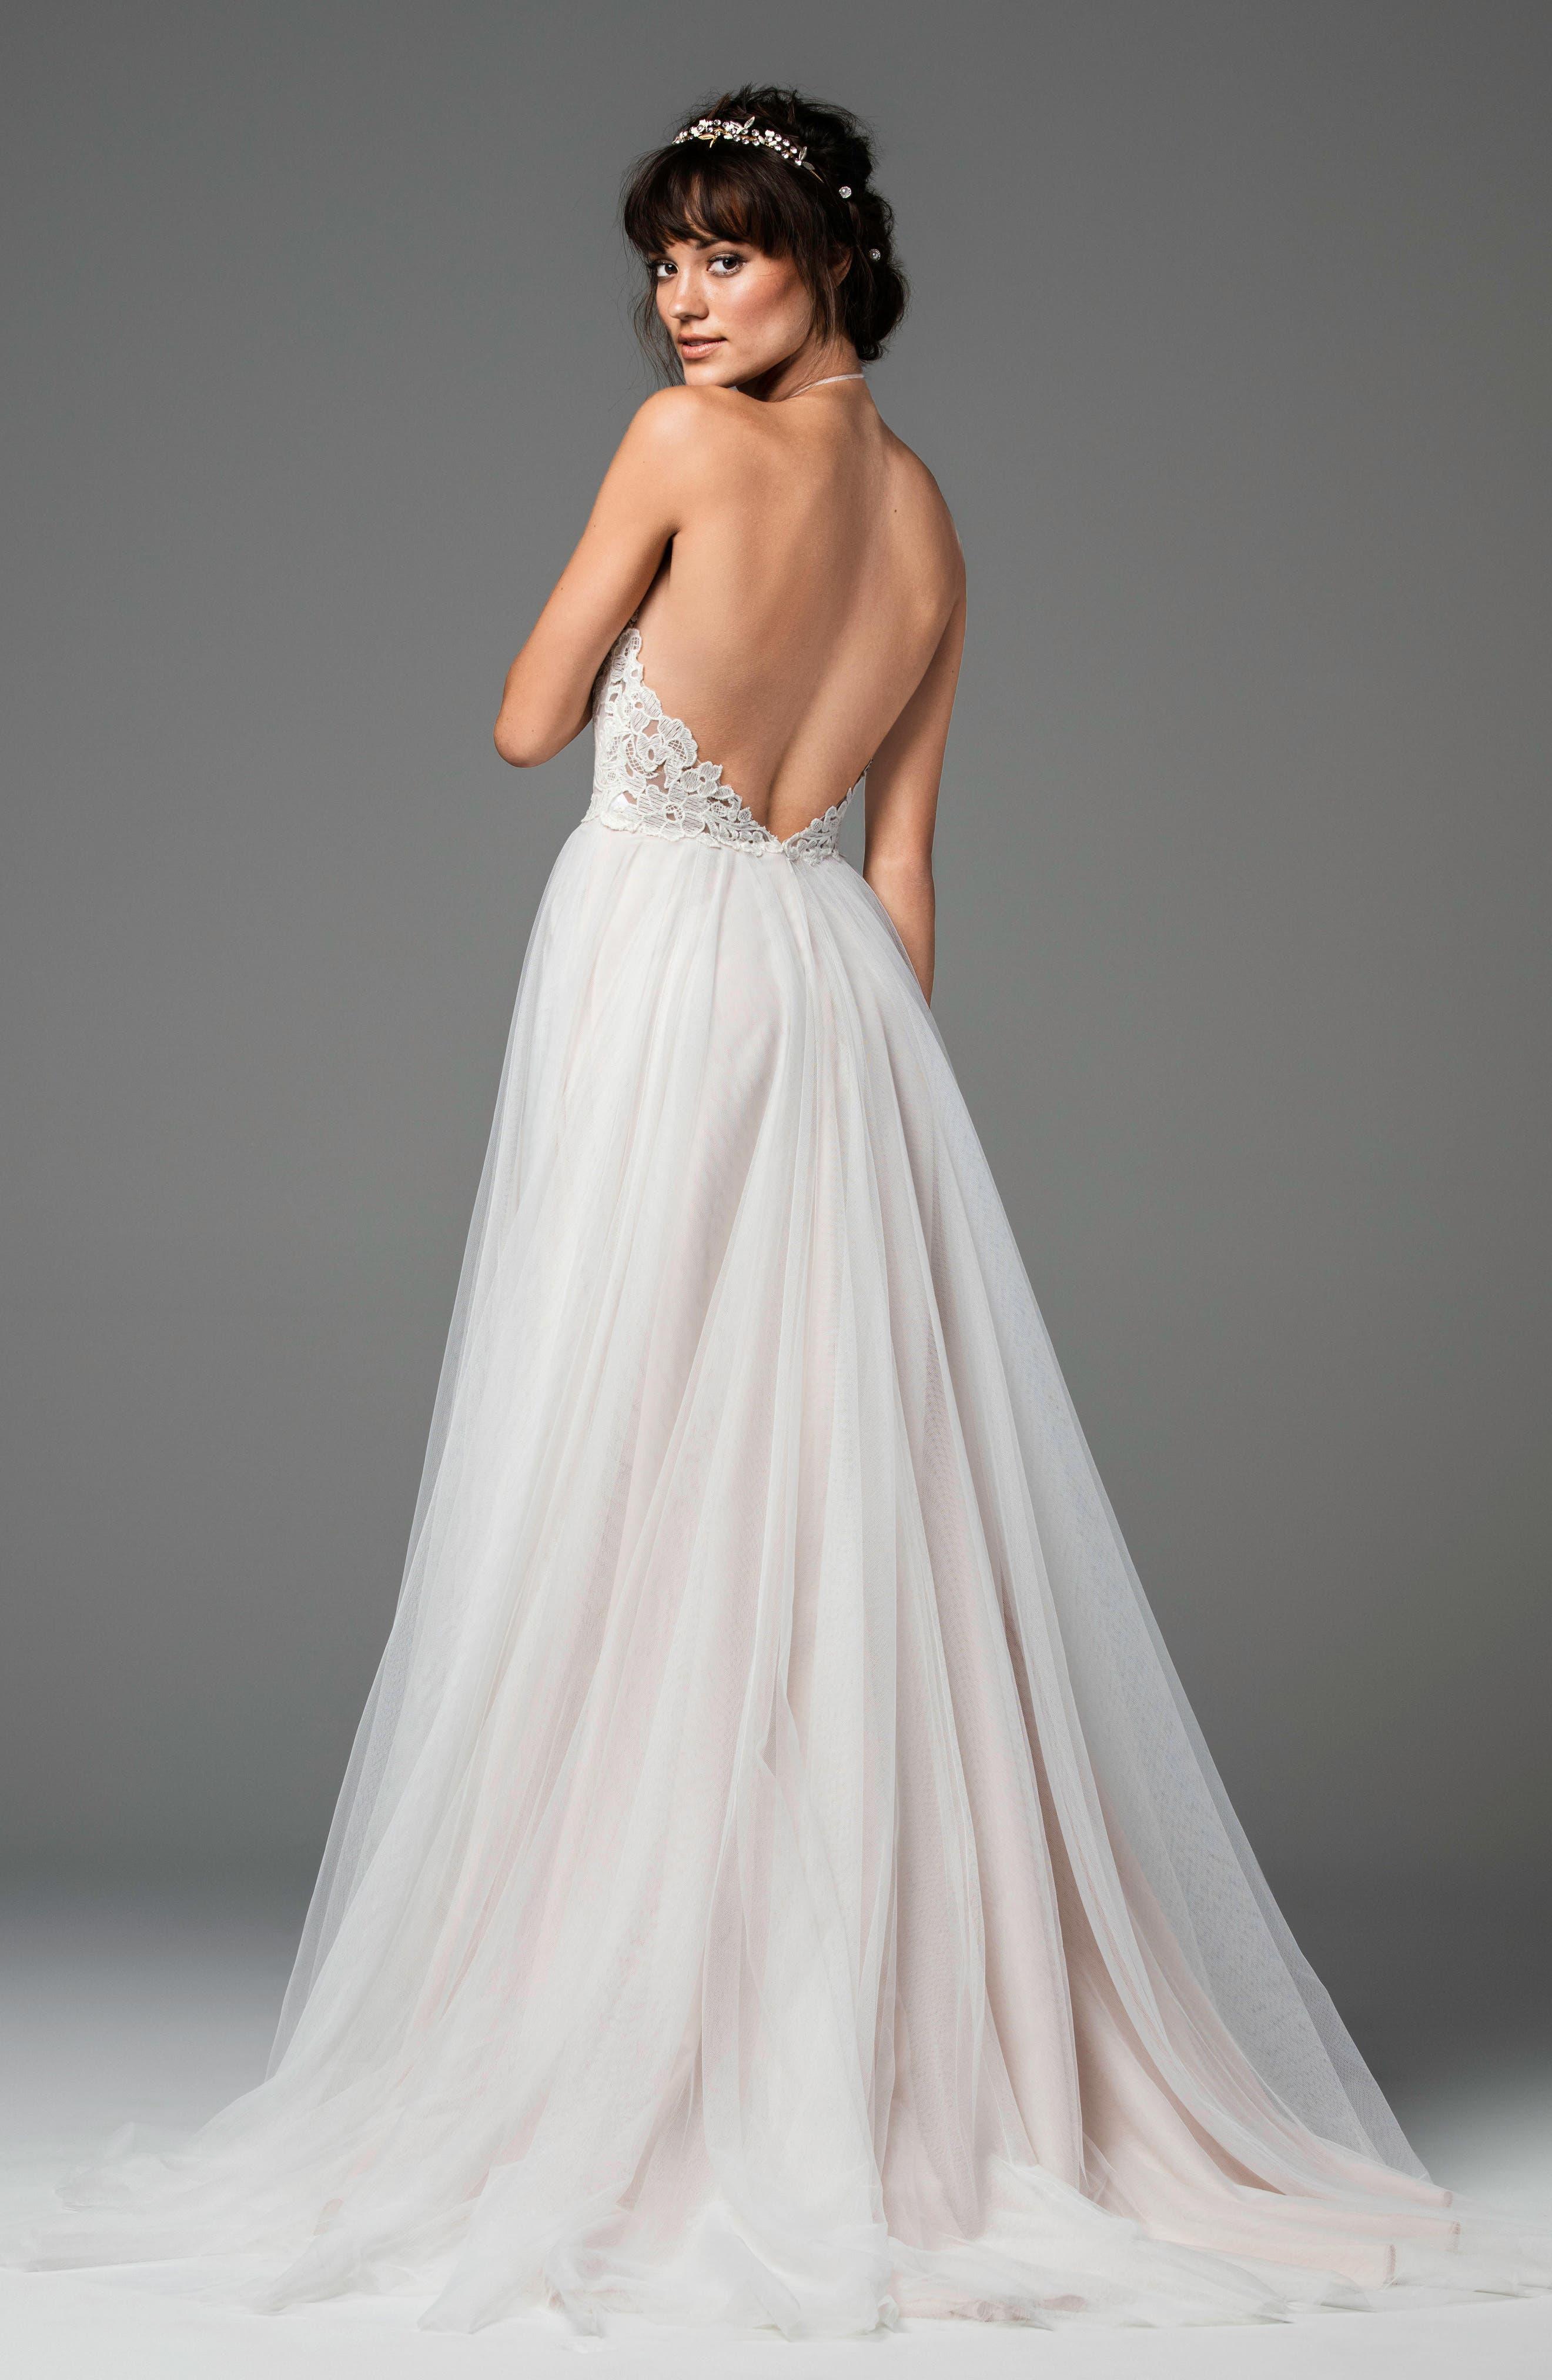 Esperance Lace & Net Halter Gown,                             Alternate thumbnail 2, color,                             Ivory/Ivory